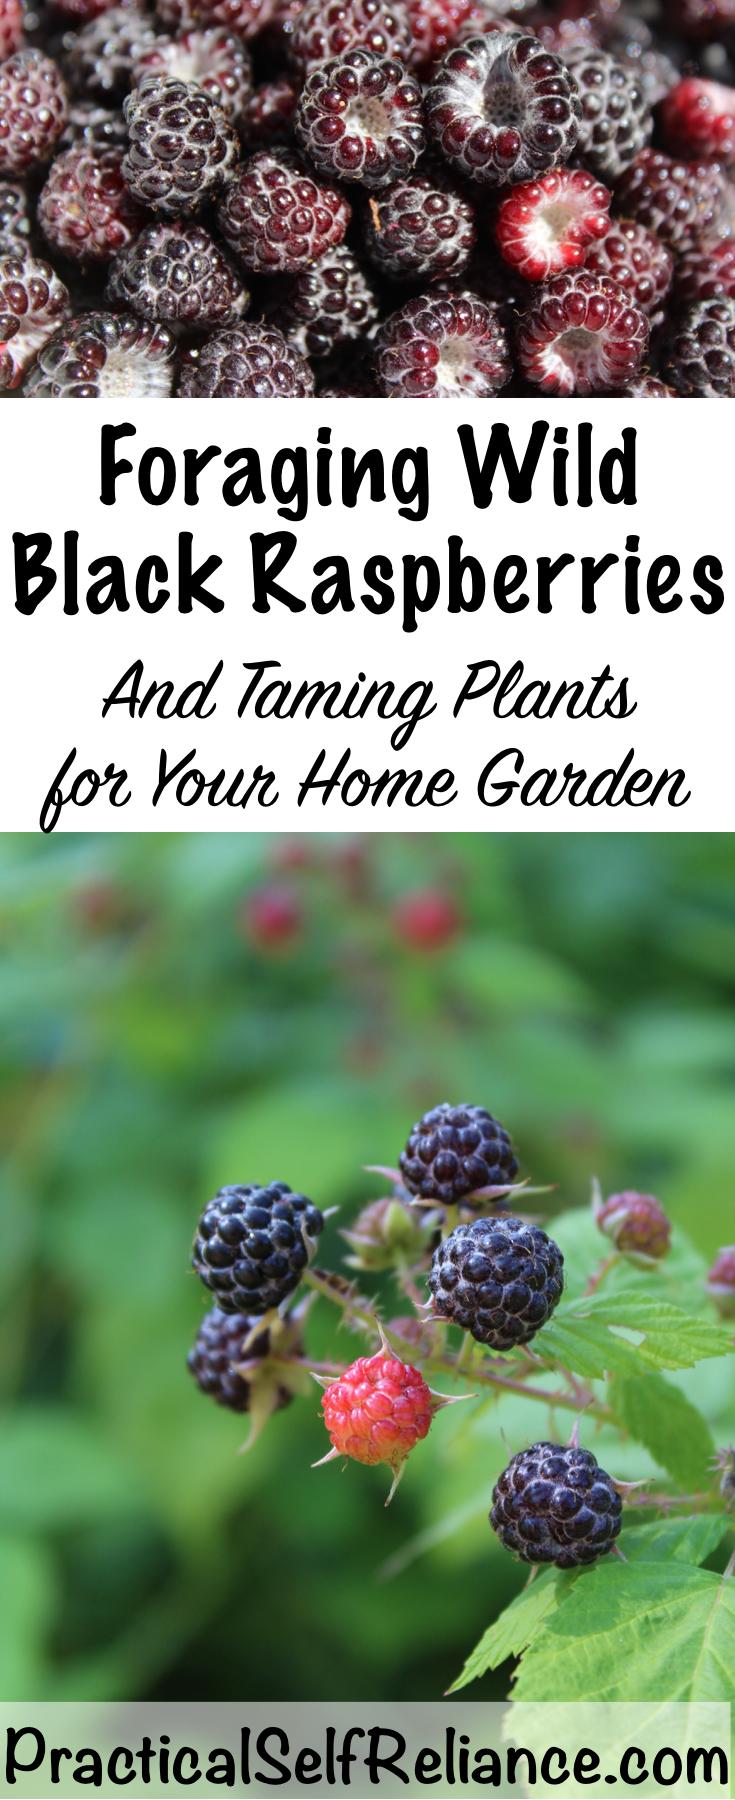 Foraging Wild Black Raspberries ~ Taming Plants for Your Home Garden #blackraspberries #raspberries #foraging #wildfood #forage #selfsufficiency #wildcrafting #gardening #organicgardening #howtogrow #gardeningtips #growingraspberries